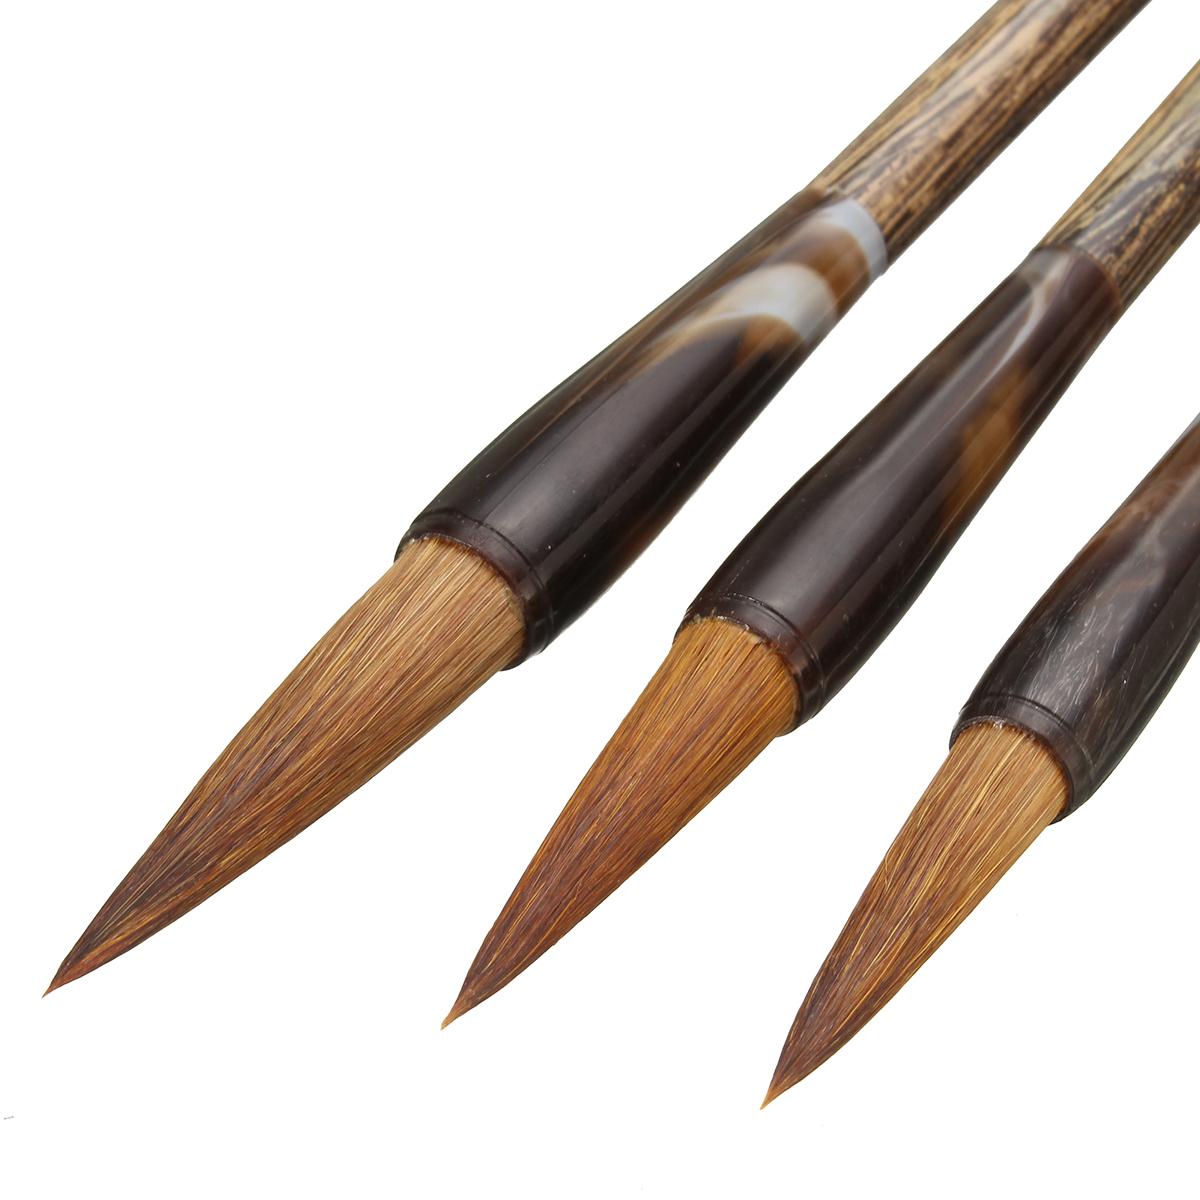 Size chinese writing brush calligraphy pen painting art